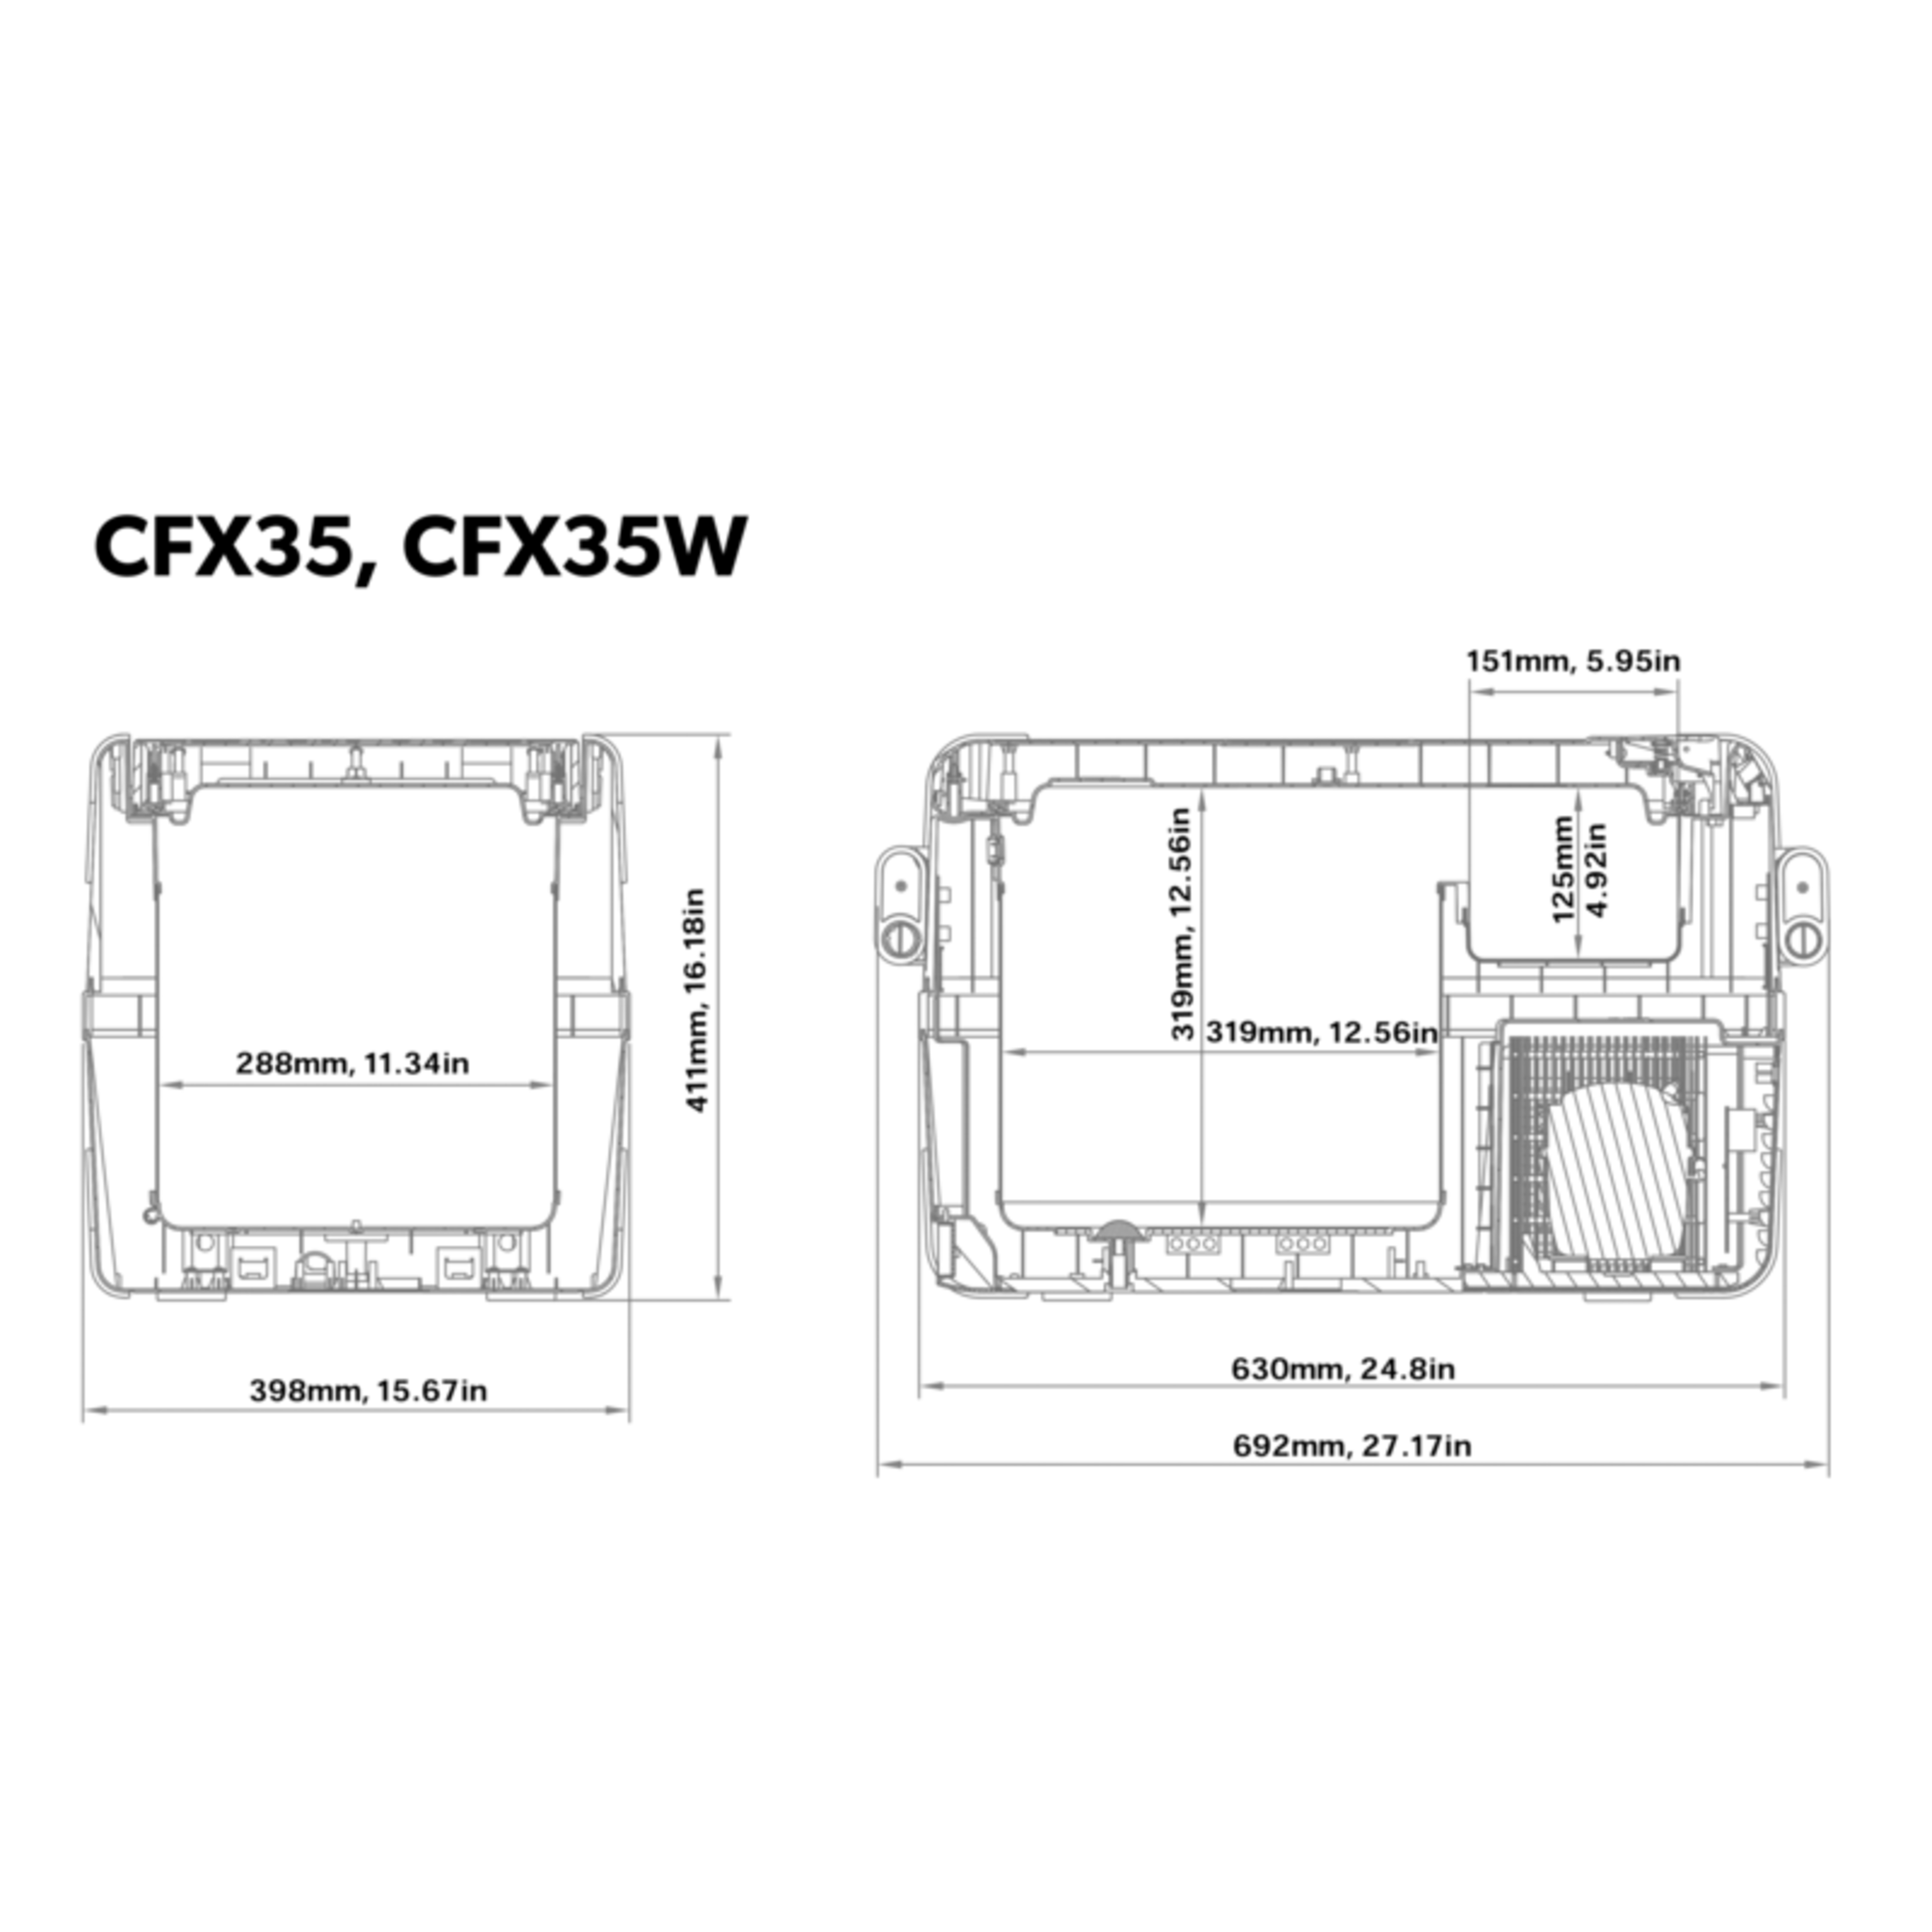 CFX 35W Dimensions